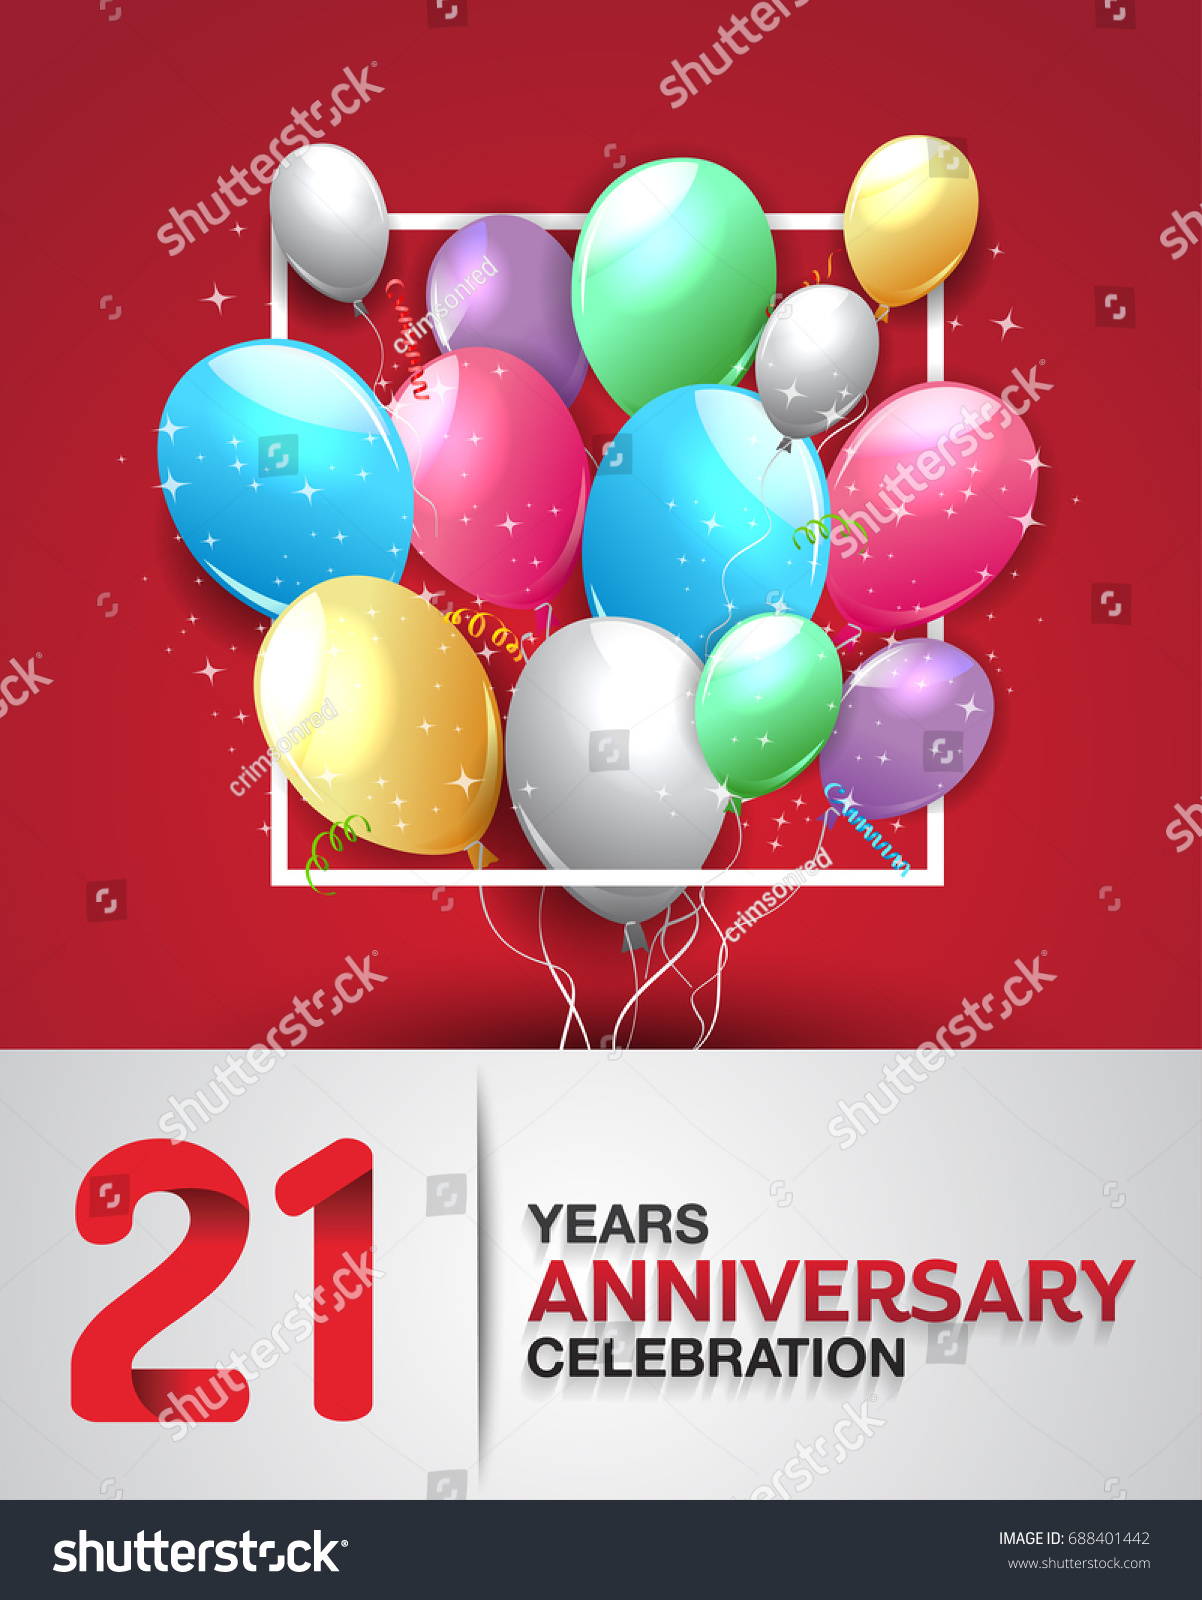 21 Years Anniversary Celebration Greeting Card Stock Vector HD ...